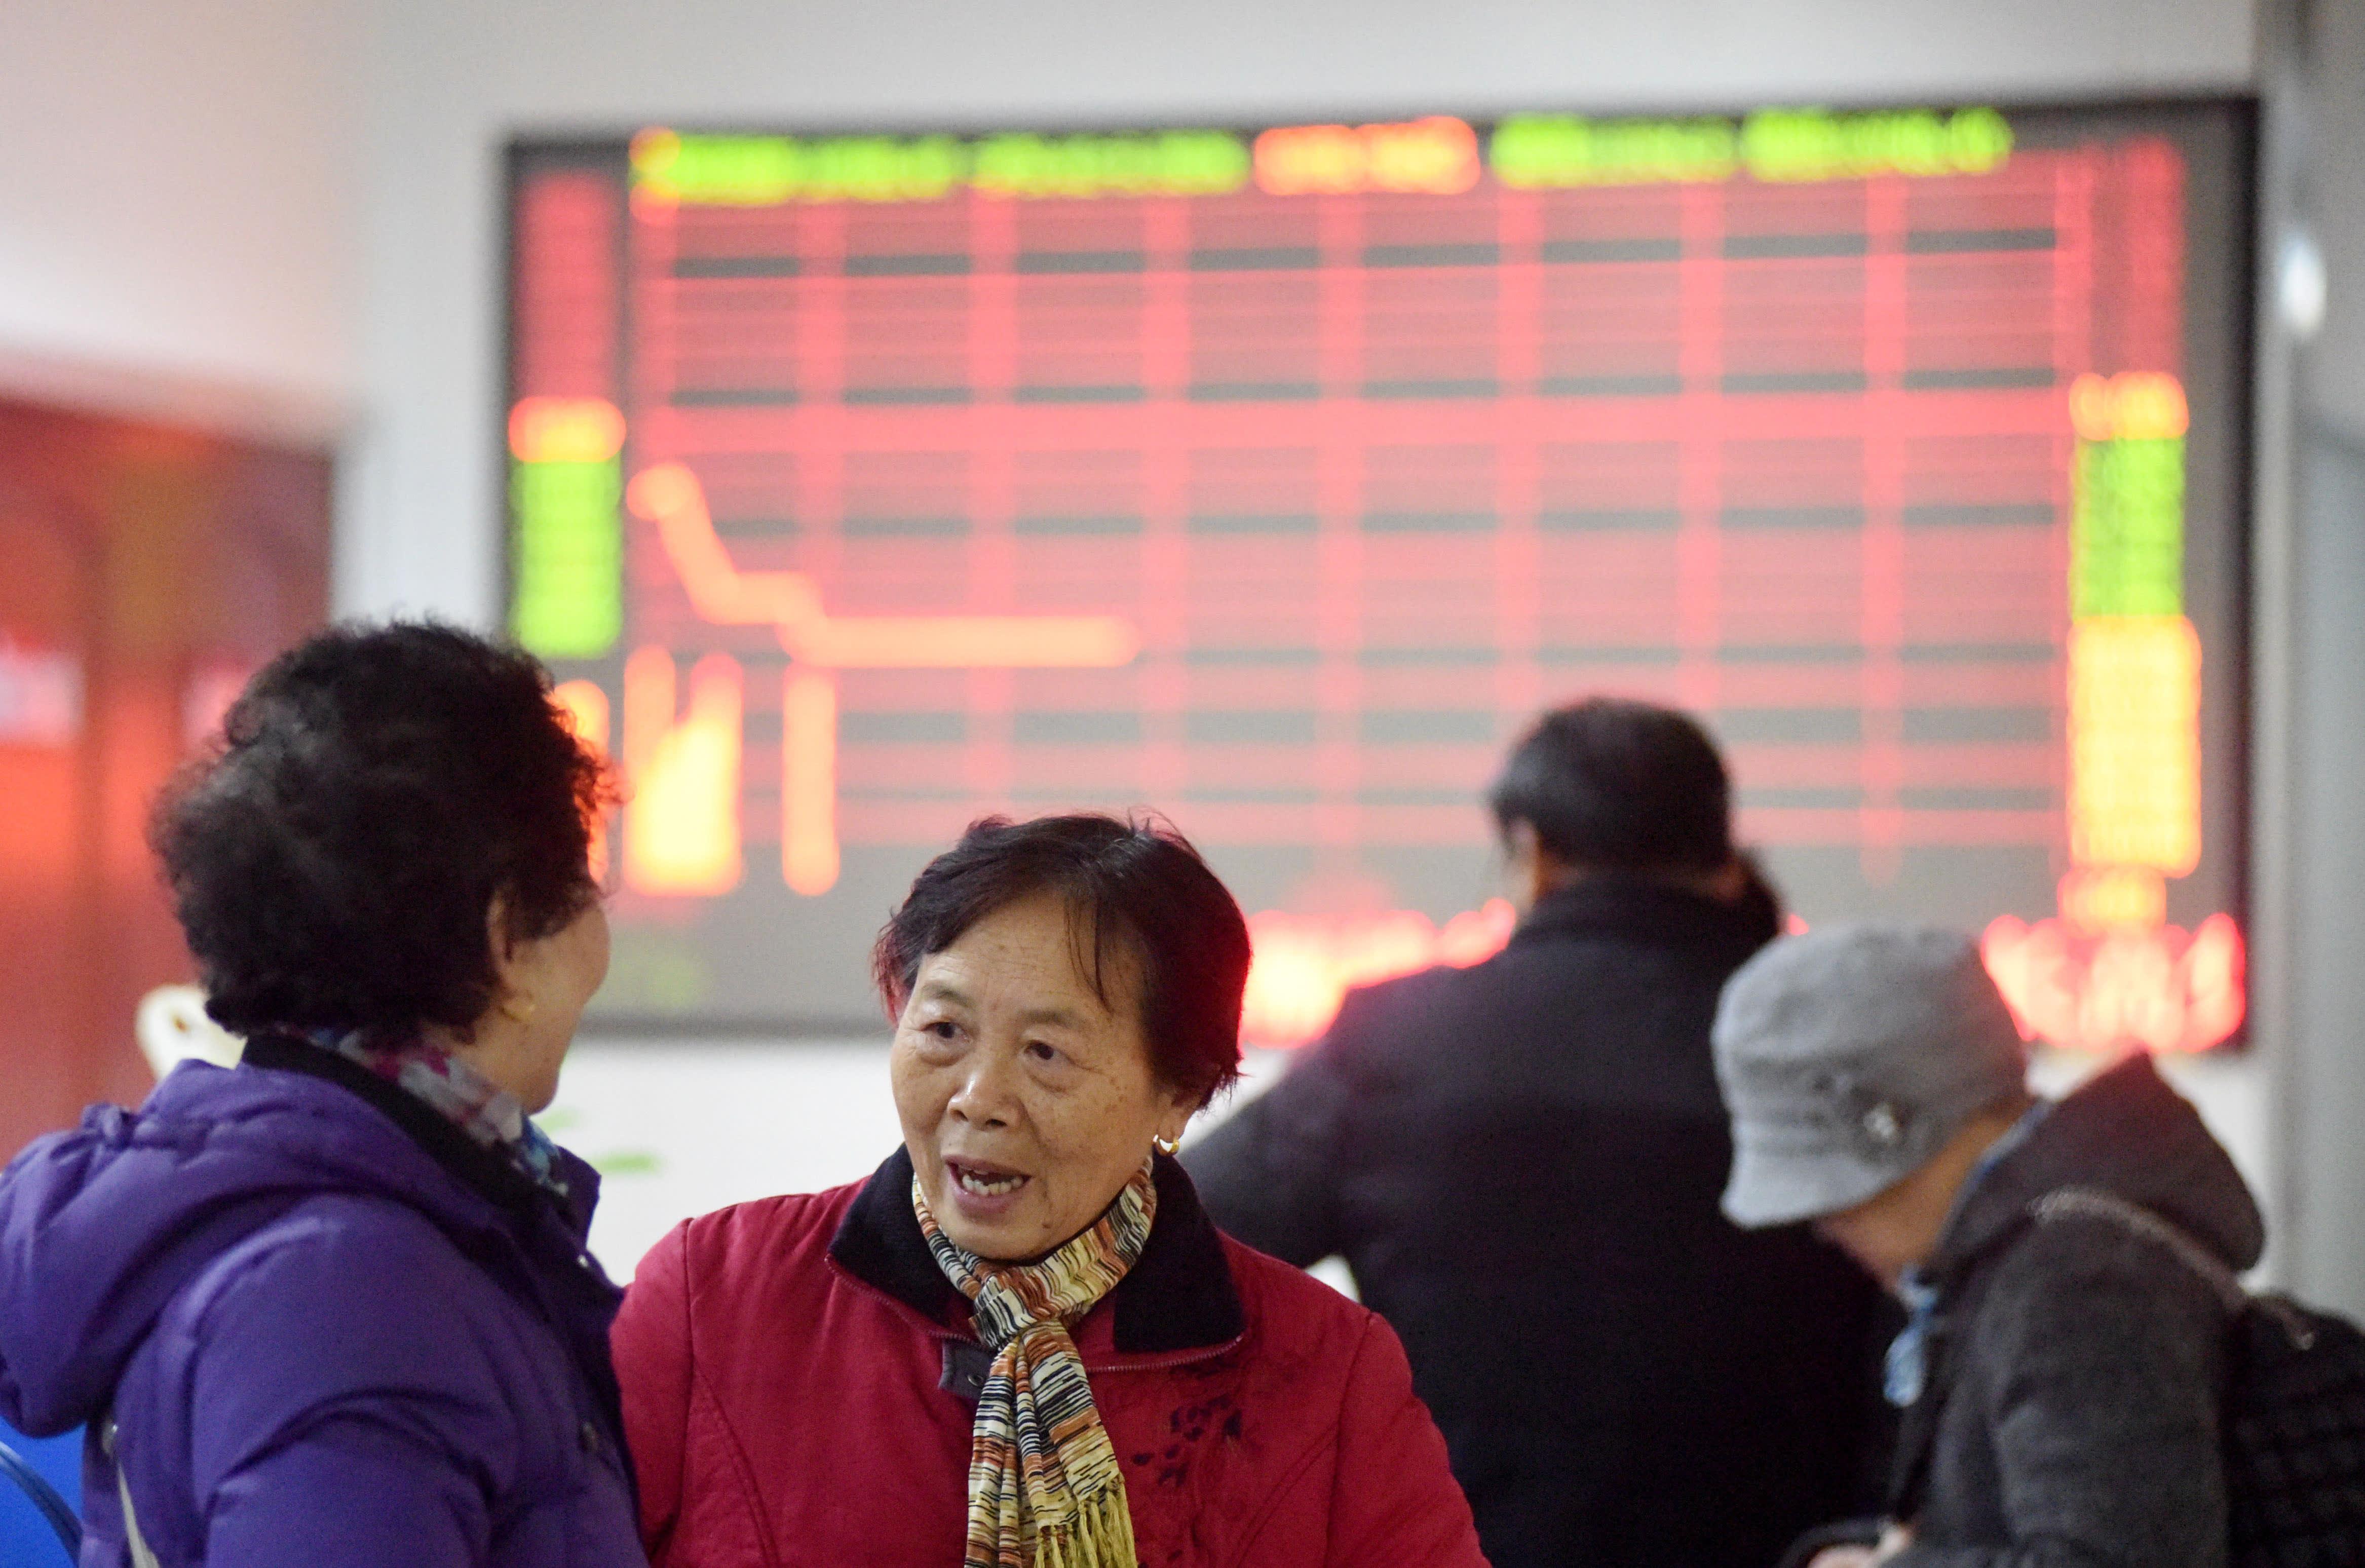 Chinese Securities Regulator Suspends Market Circuit Breakers How Do Work In The Stock Markets